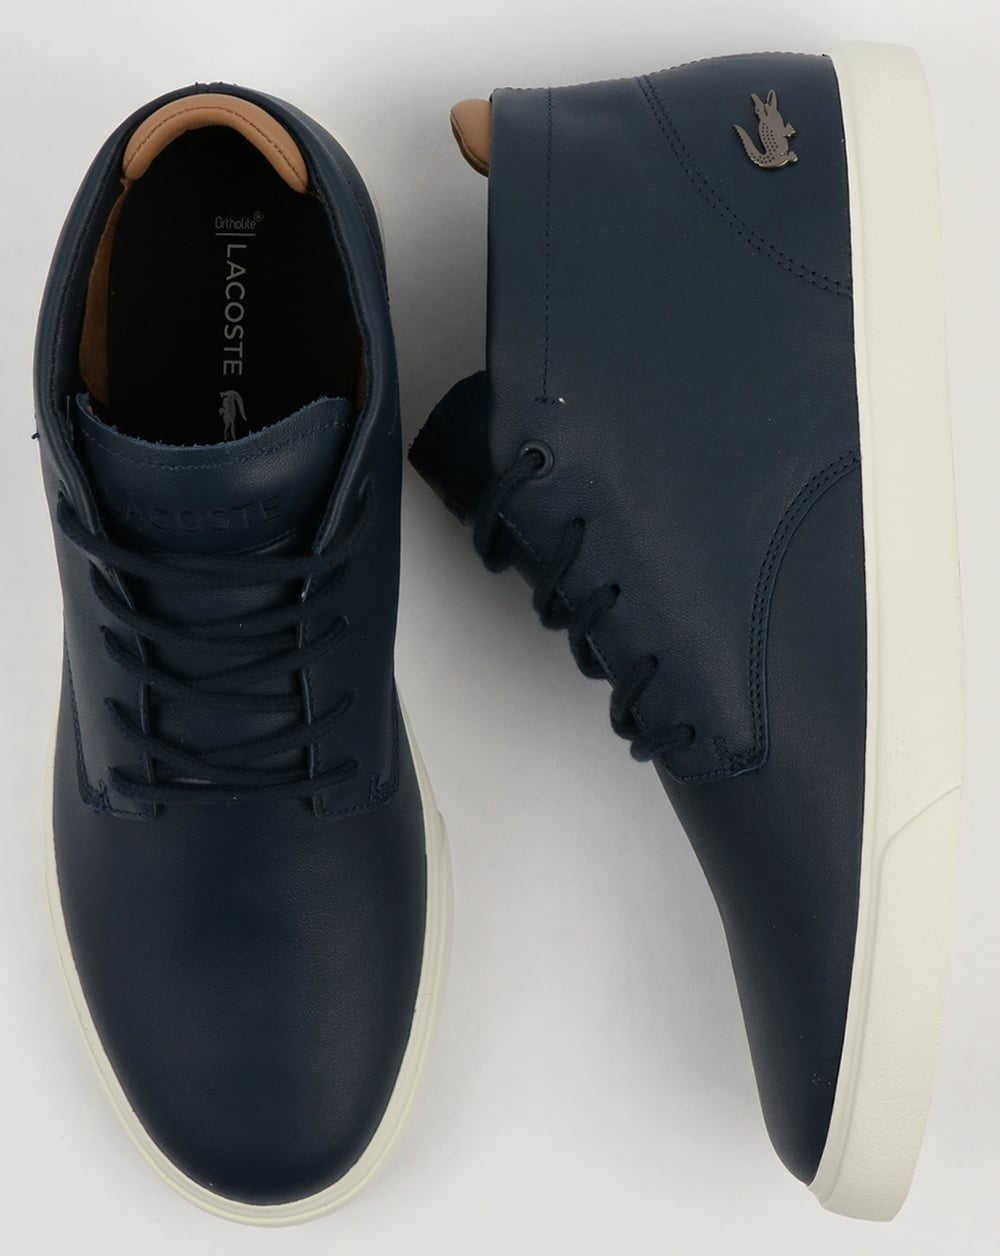 00f3b6e176 Lacoste Footwear Espere Chukka Boots Navy